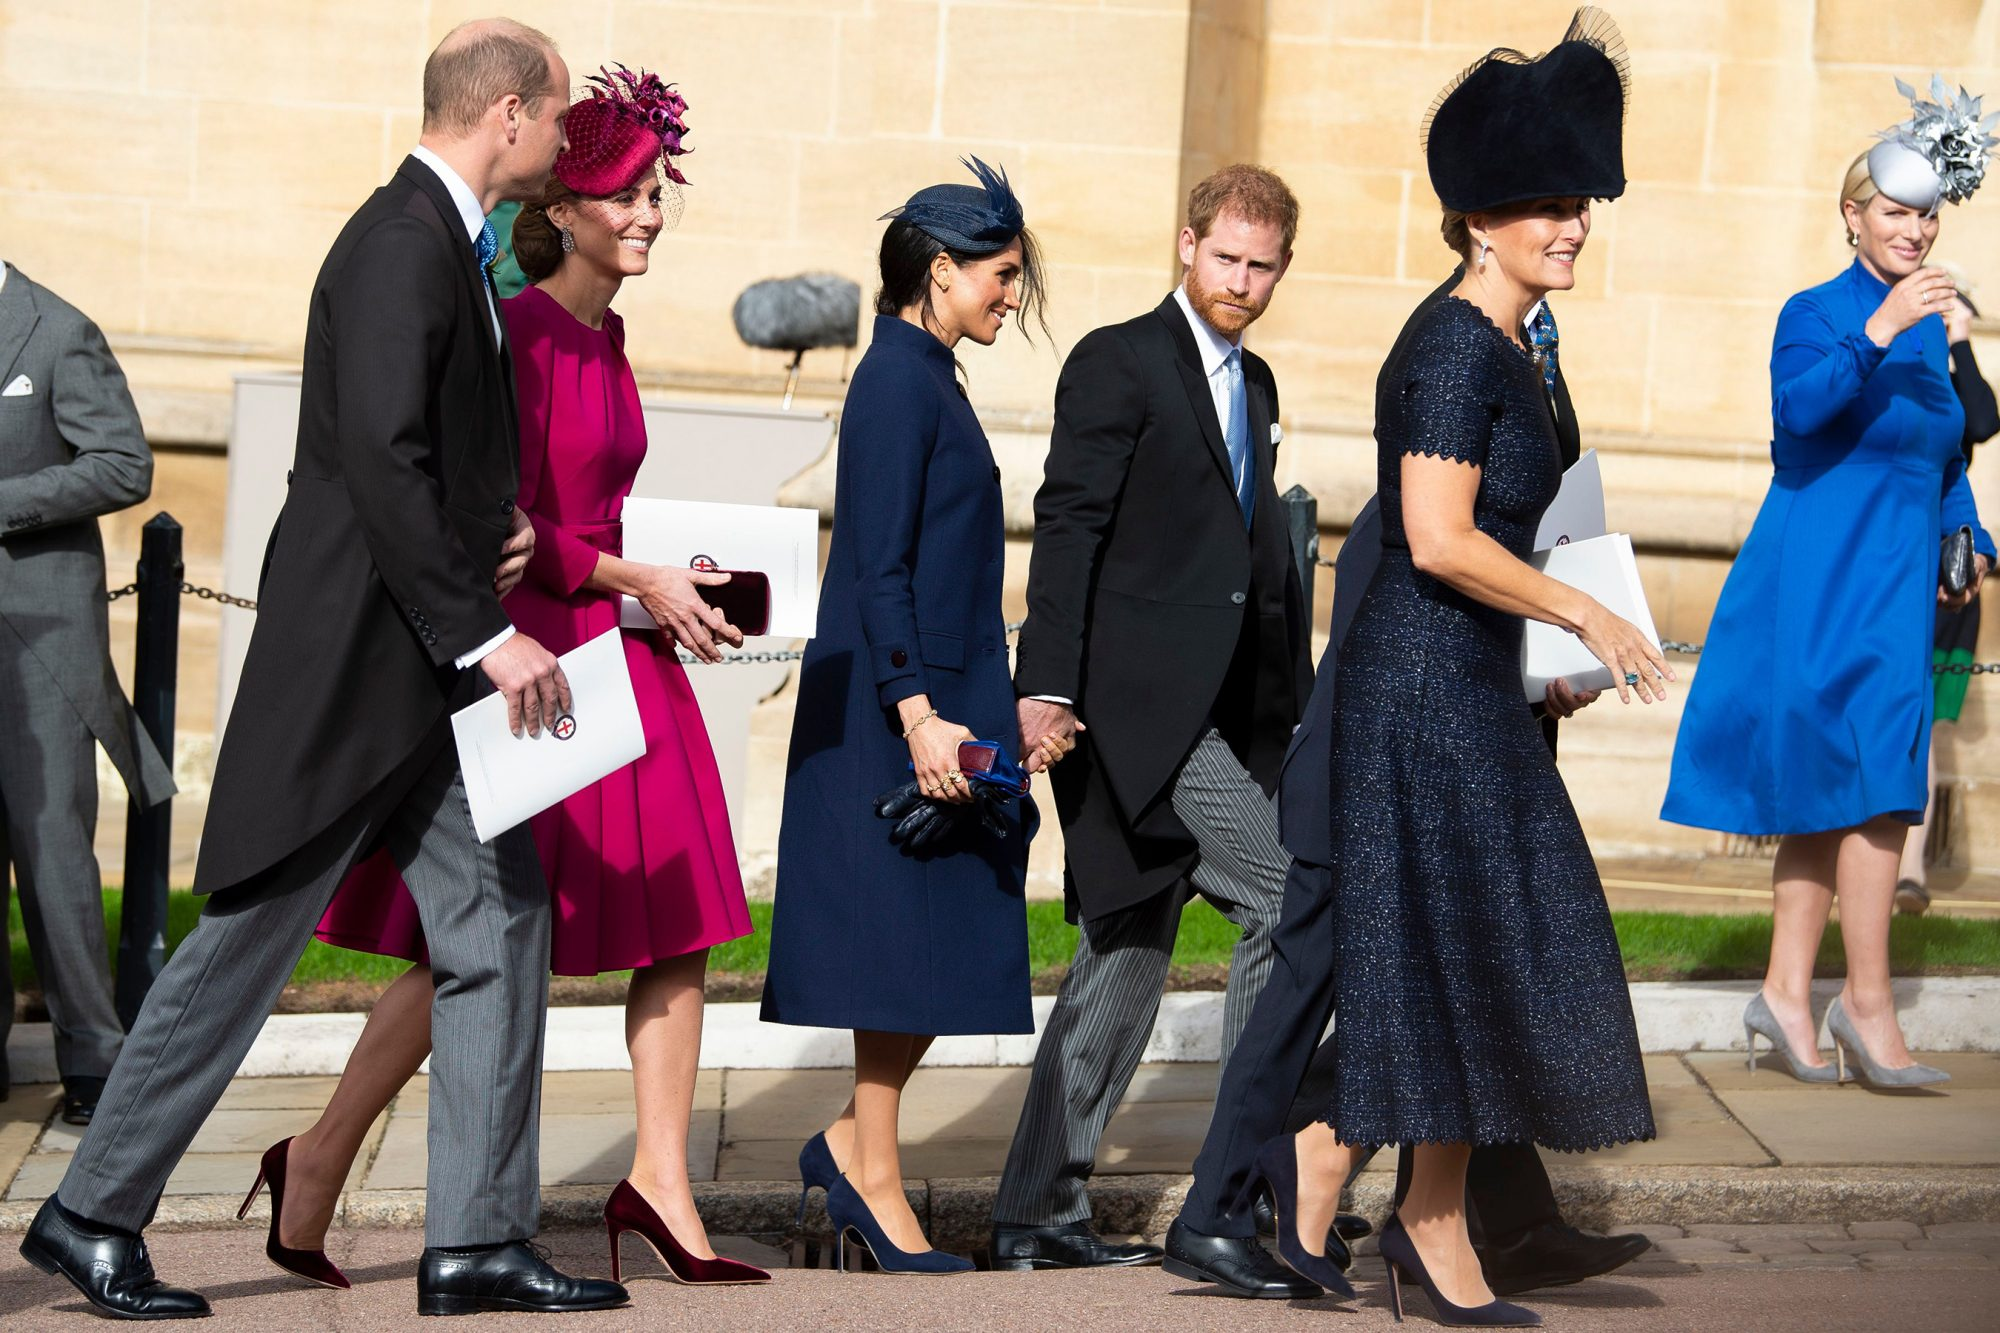 Royal Wedding of Princess Eugenie and Jack Brooksbank in Windsor, London, United Kingdom - 12 Oct 2018